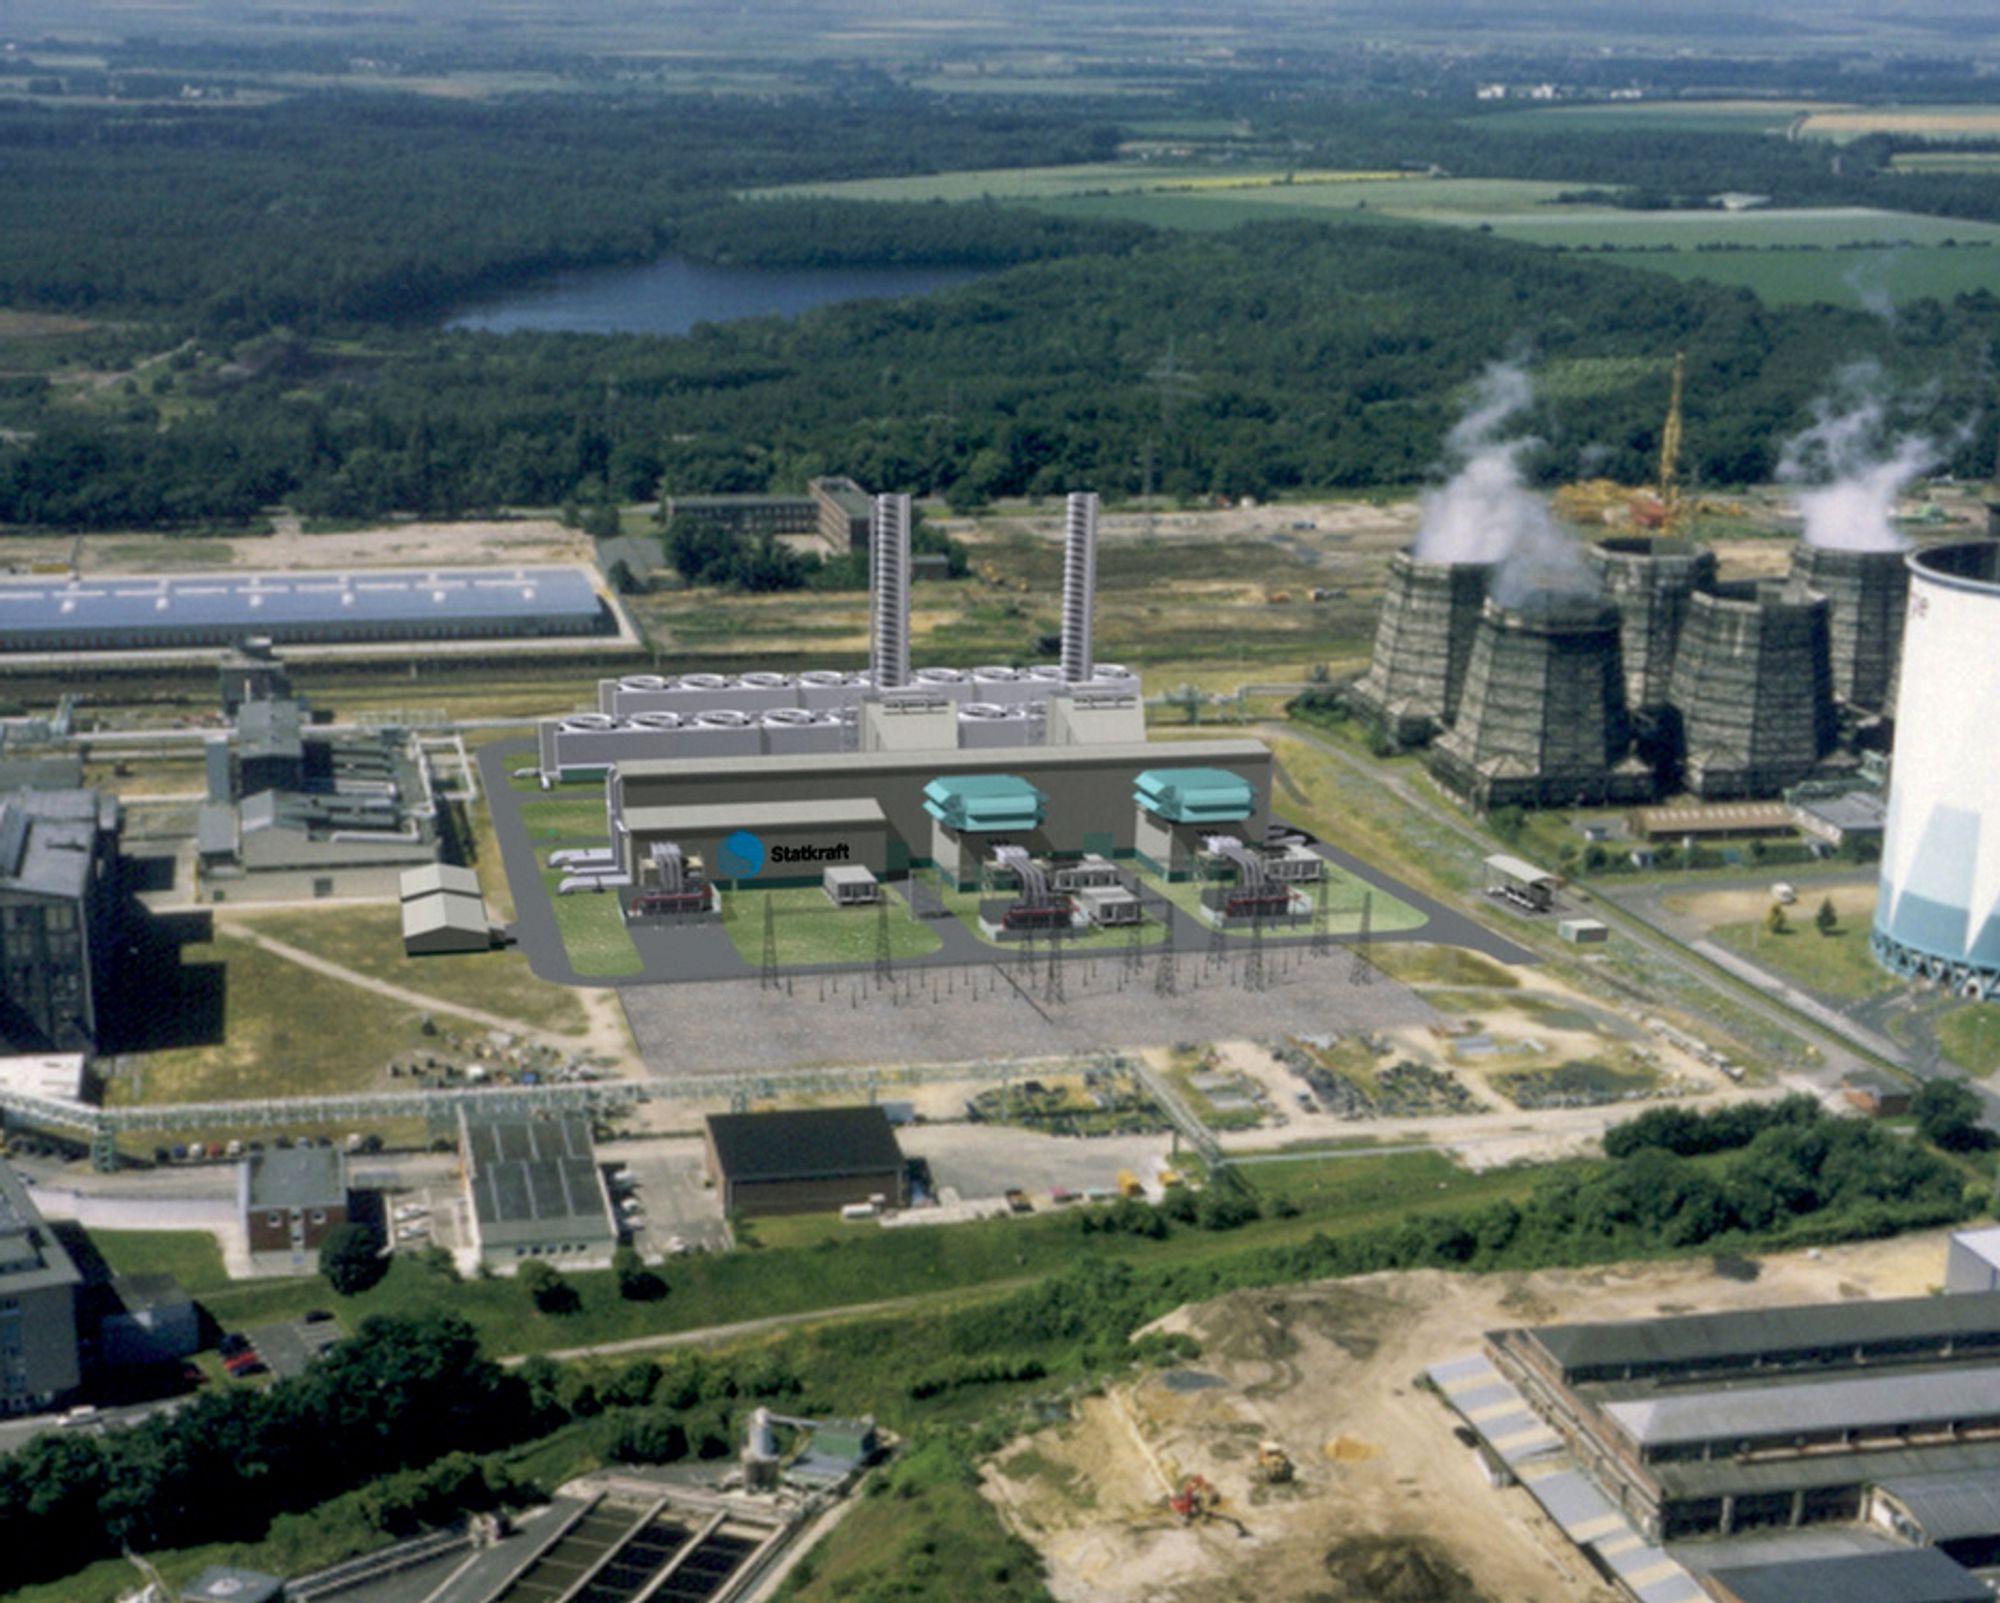 ÅPNET: Statkrafts gasskraftverk i Knapsack  i Tyskland får en totaleffekt på 800MW.